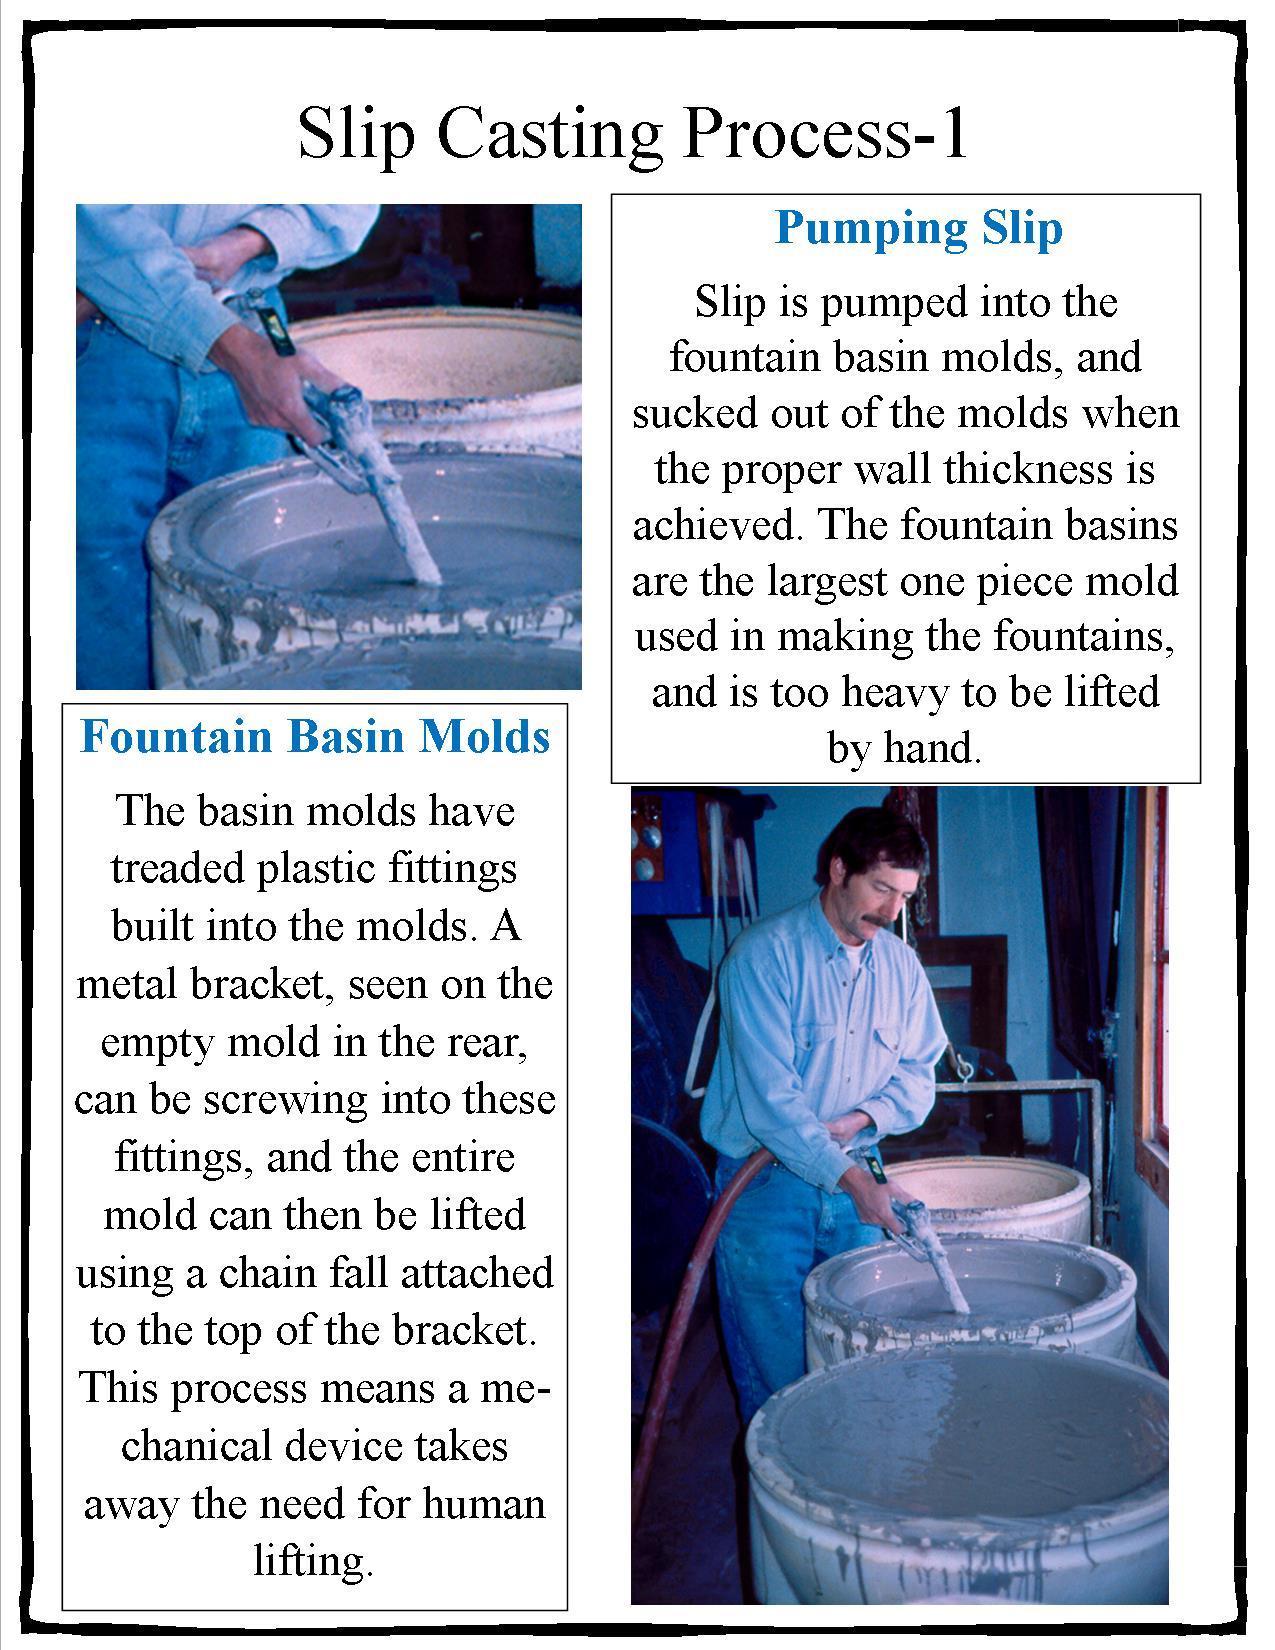 Slip Casting Process-1